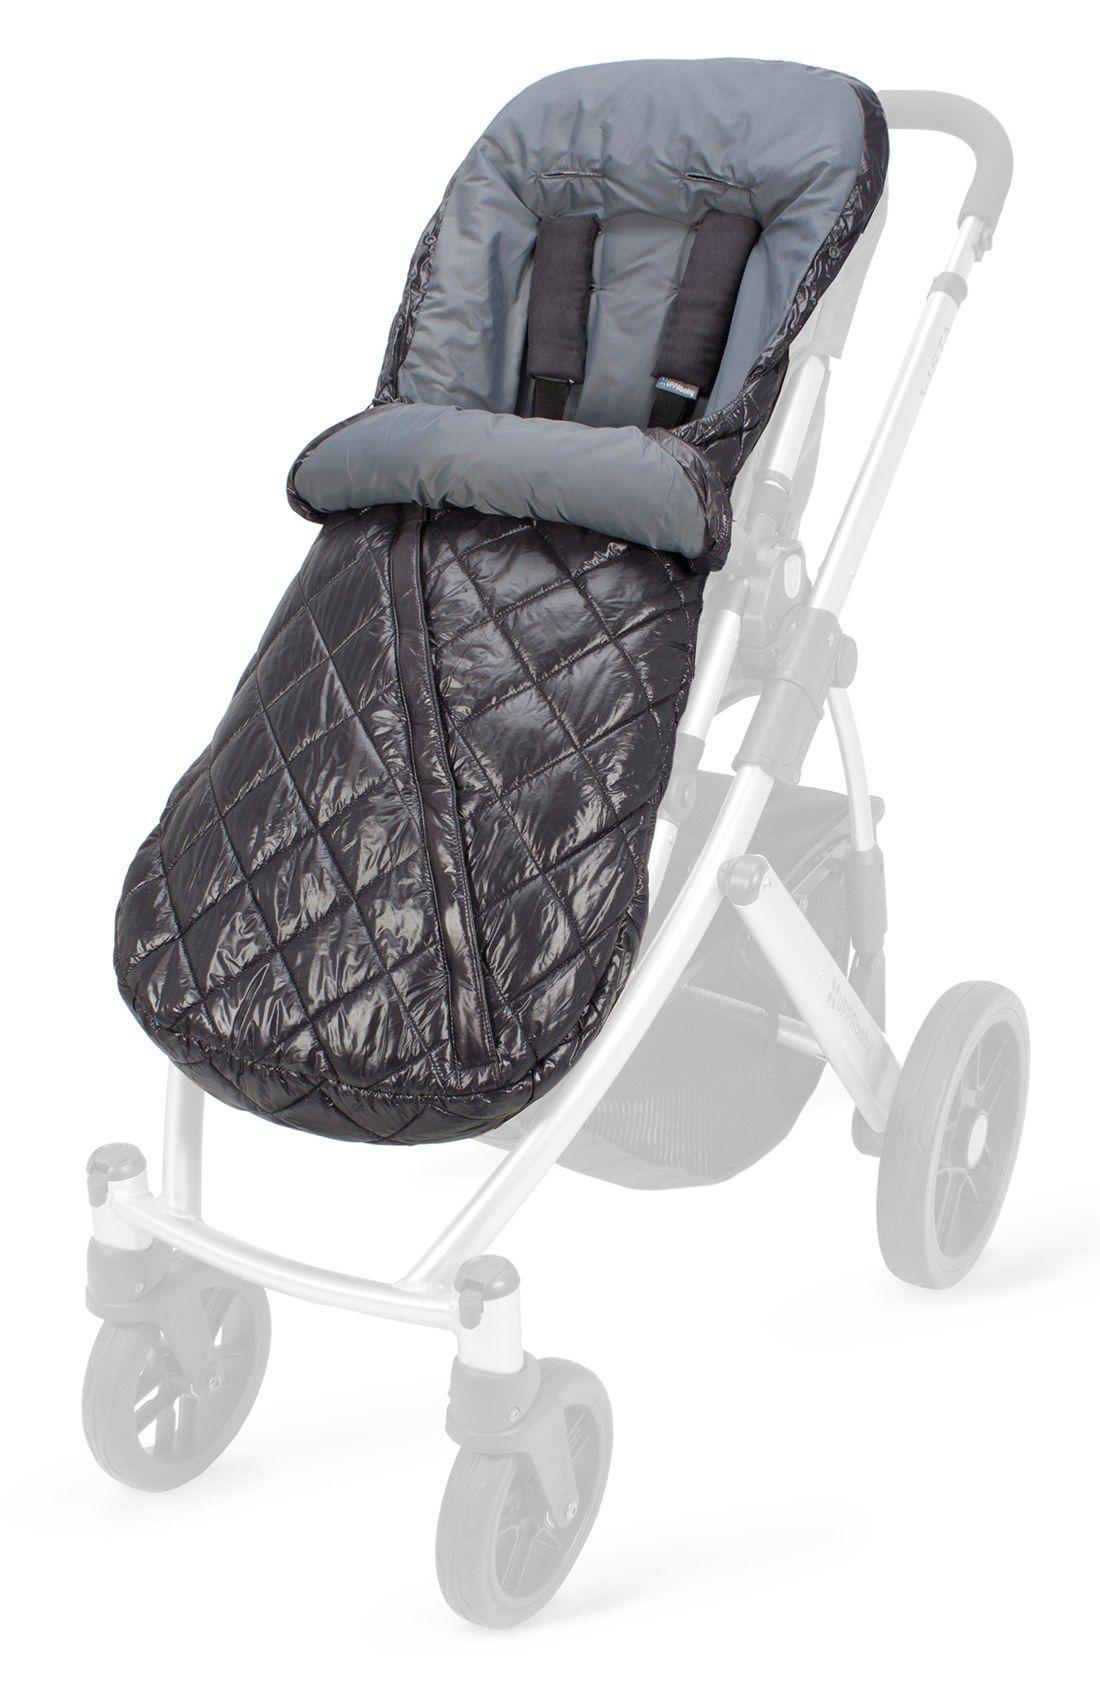 UPPAbaby 'BabyGanoosh' Stroller Footmuff Stroller